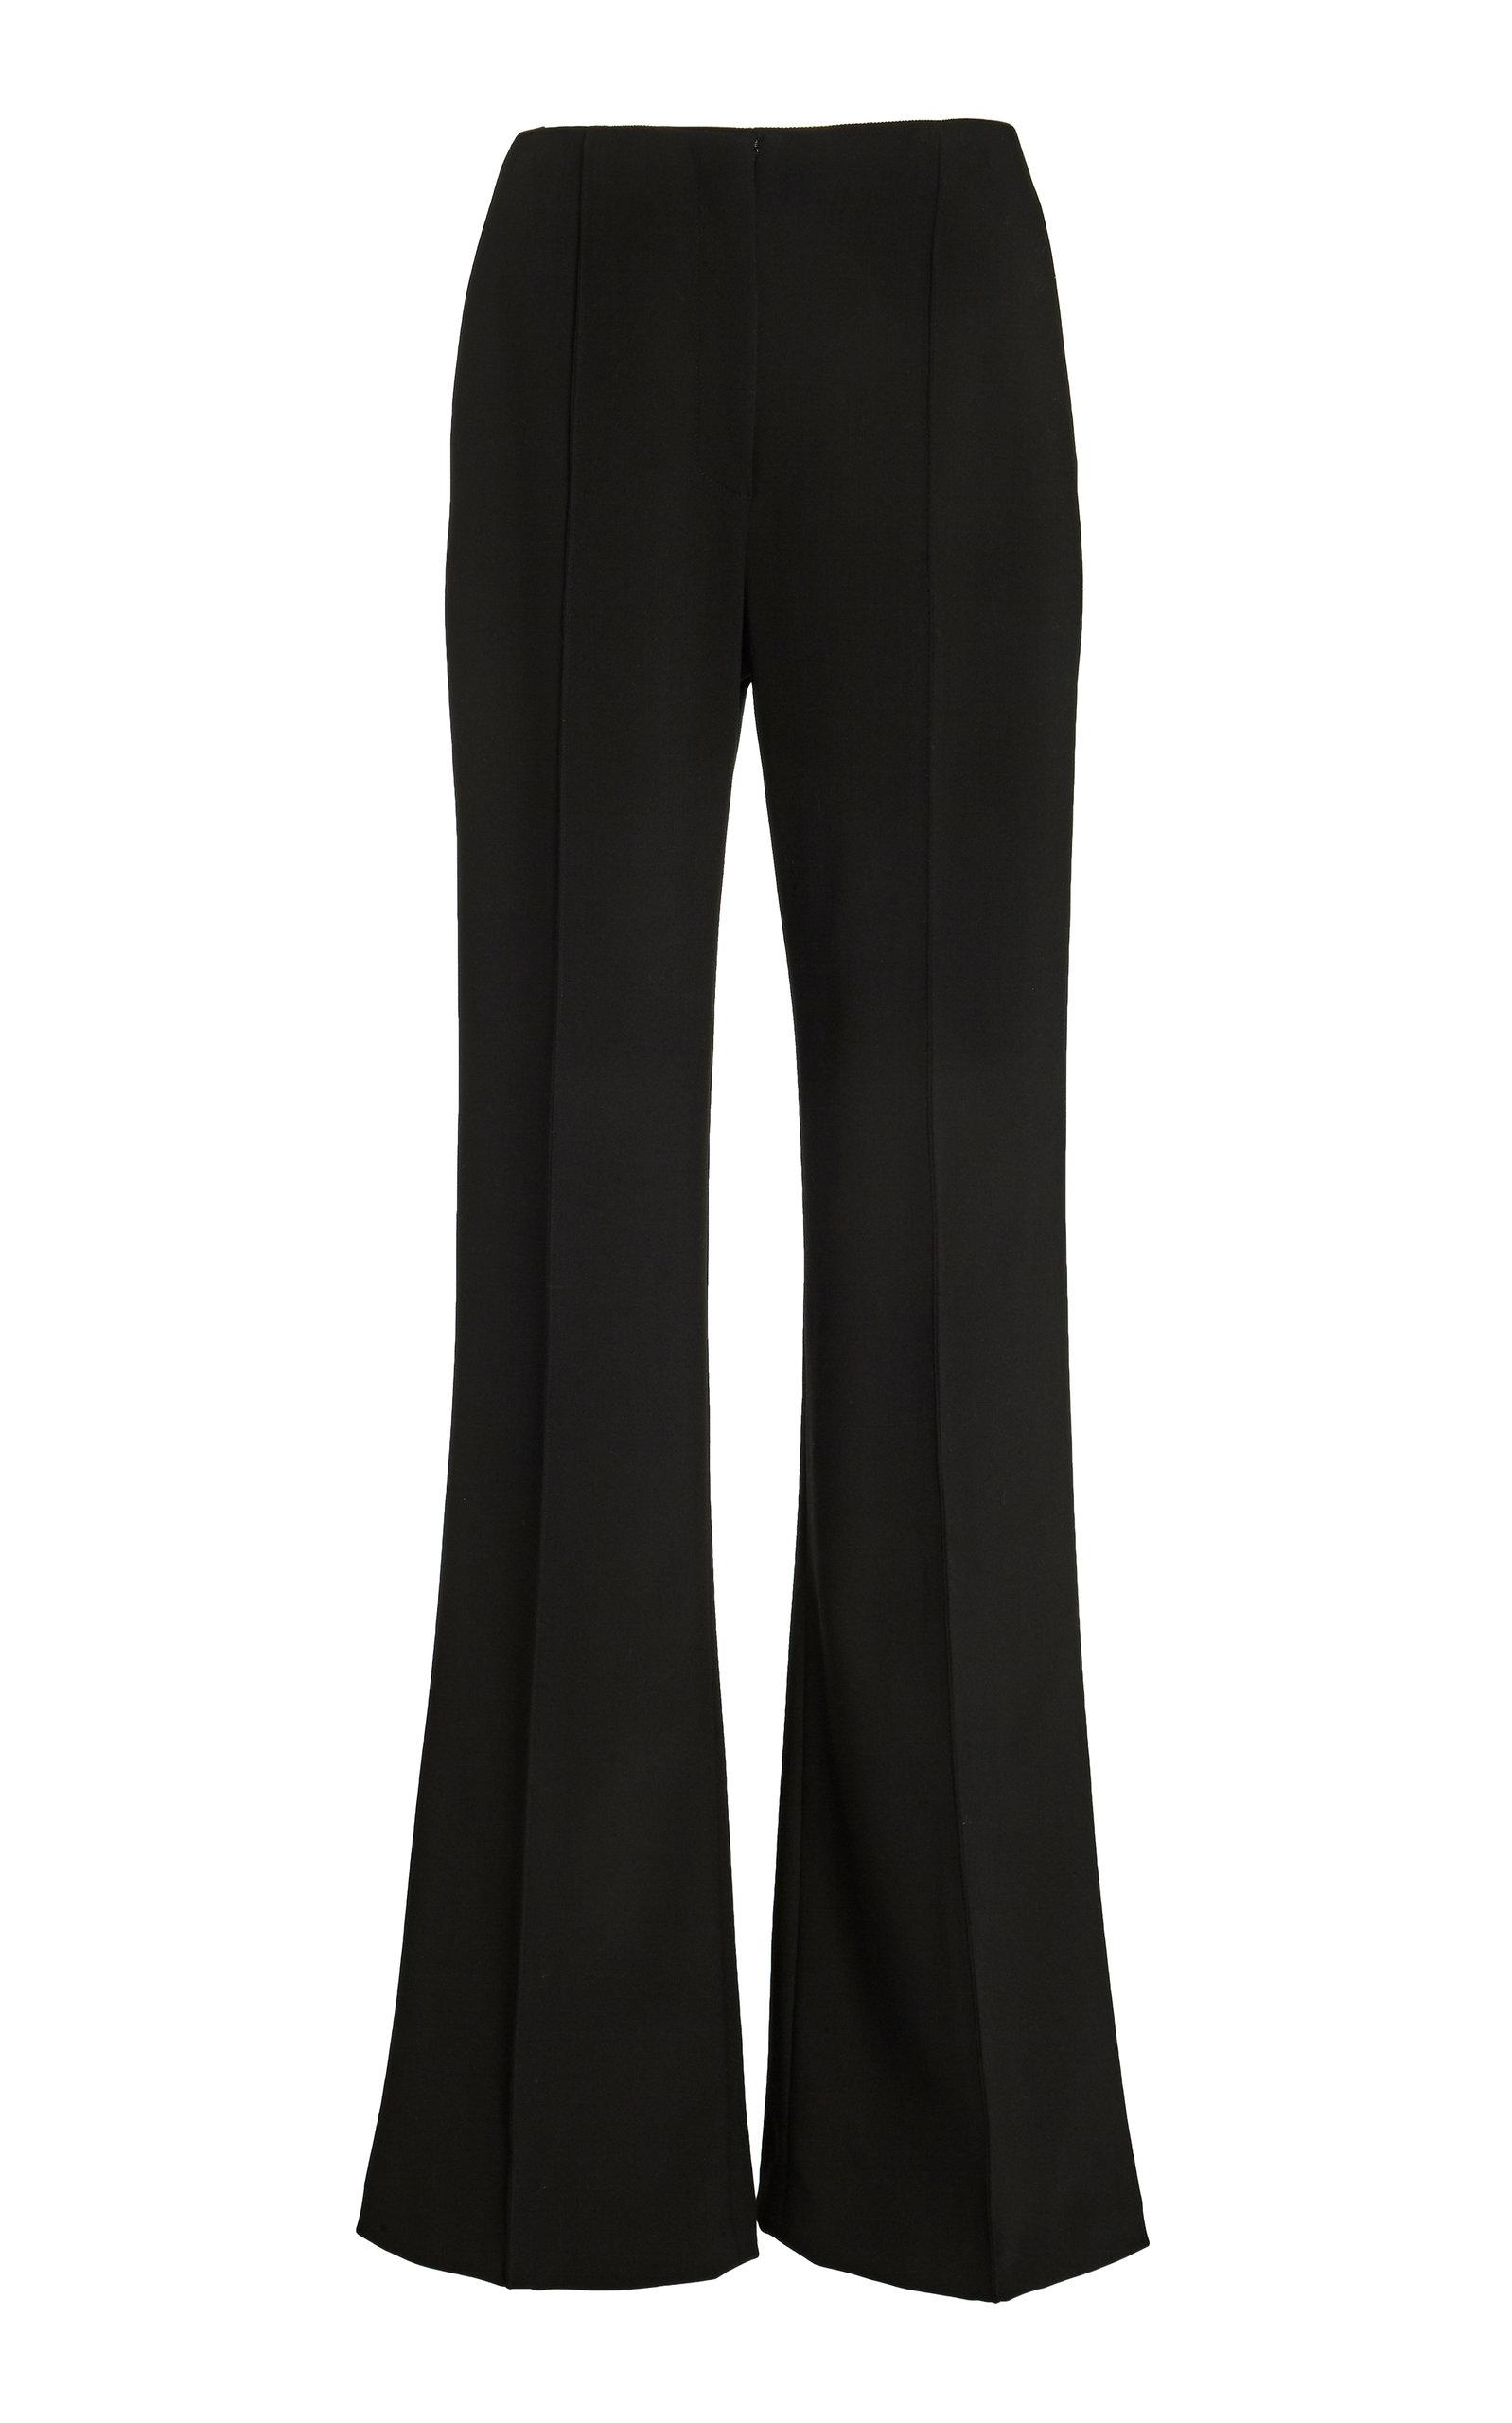 Carolina Herrera Pants HIGH-WAISTED SILK-CREPE FLARED PANTS SIZE: 8